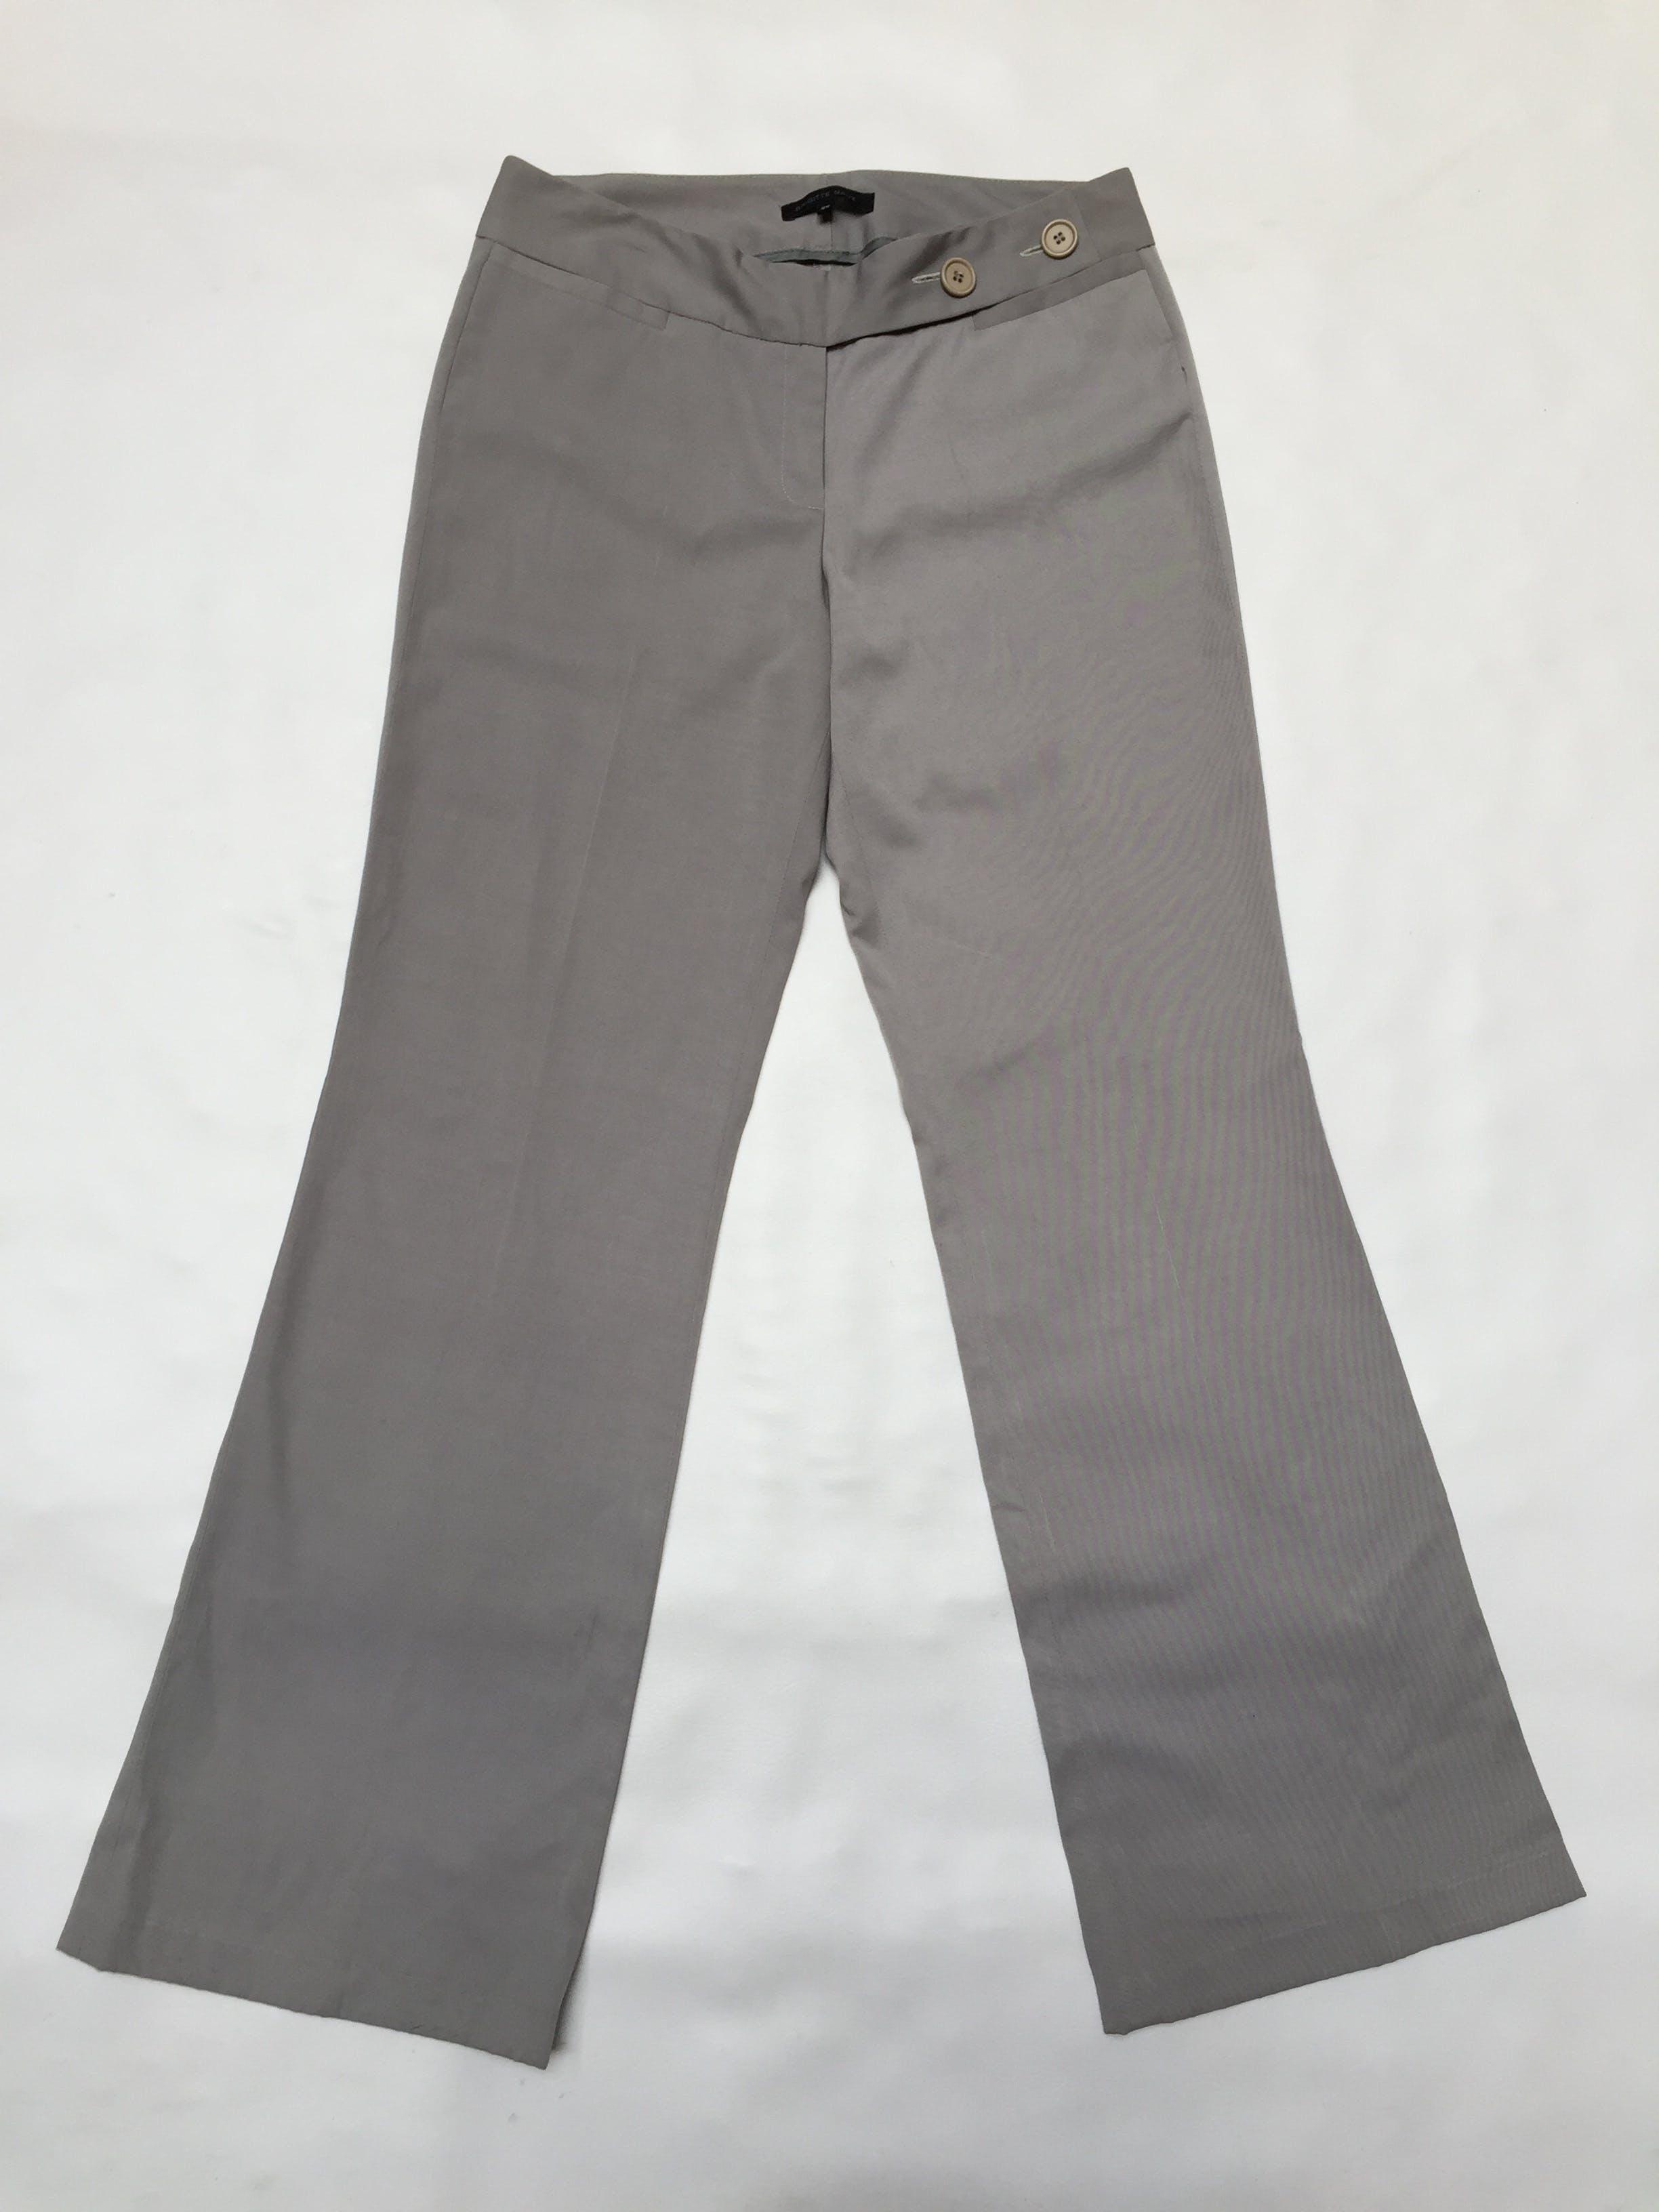 pantalon-BNX Brigitte Naux-imagen